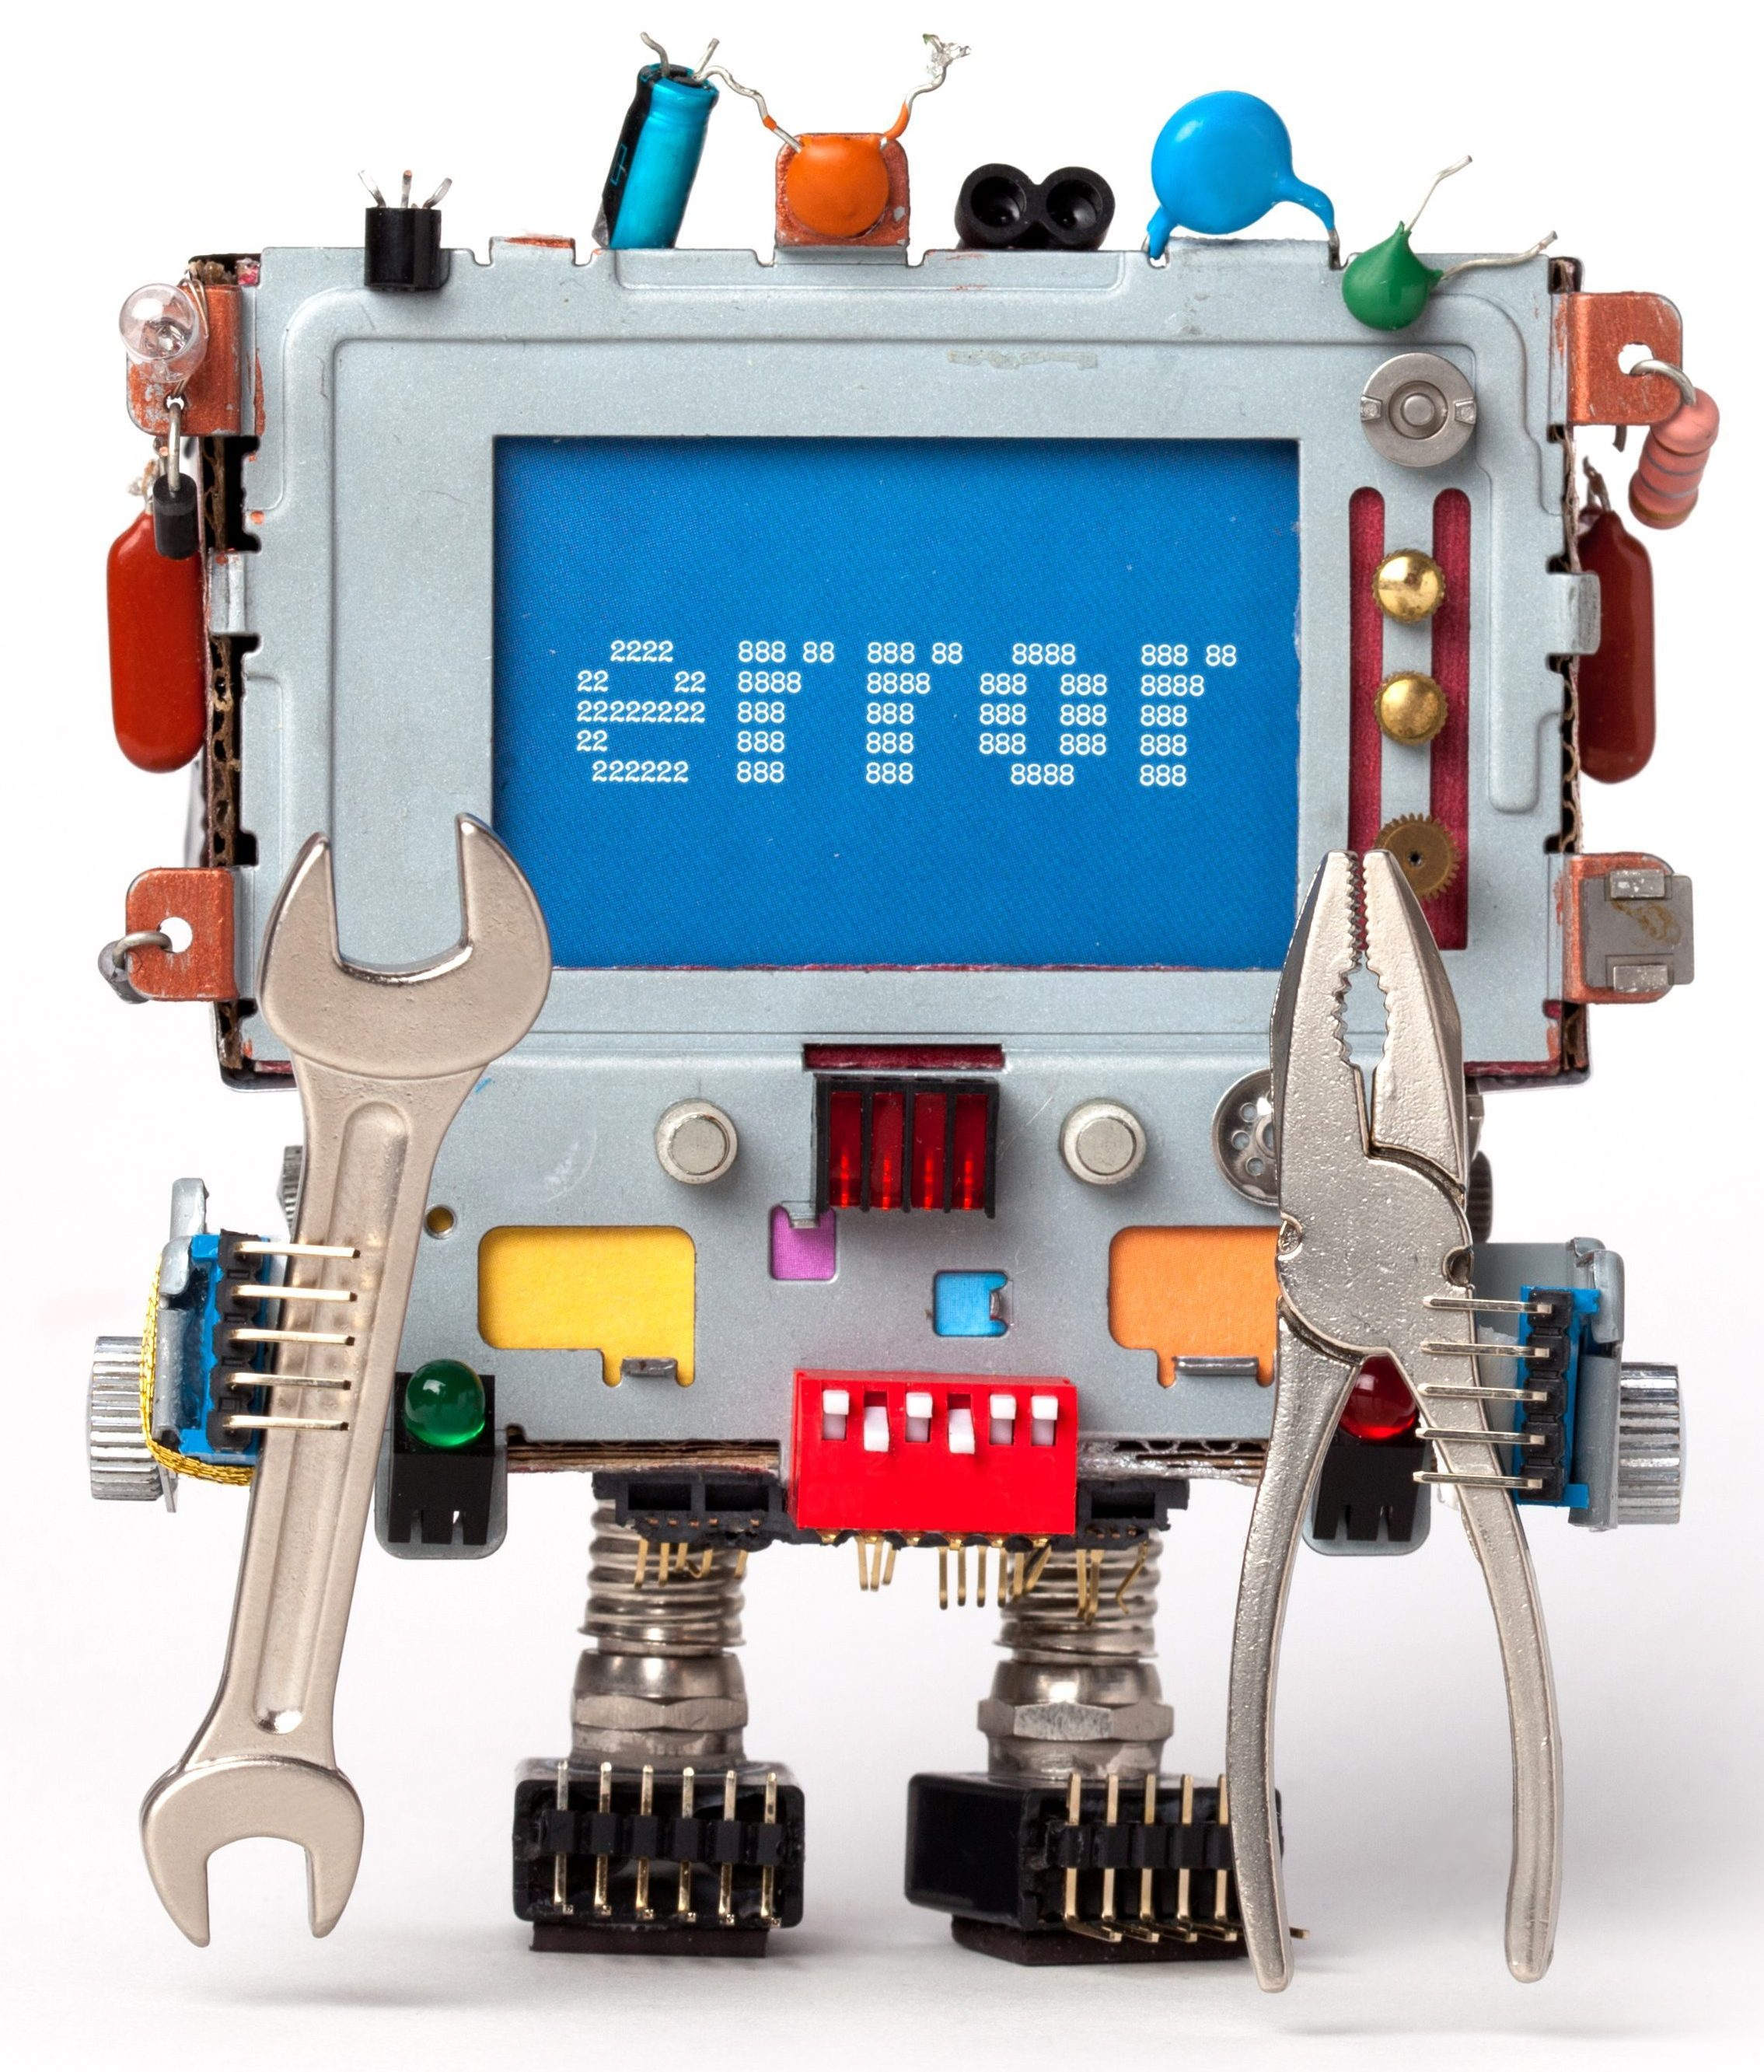 Handy robot